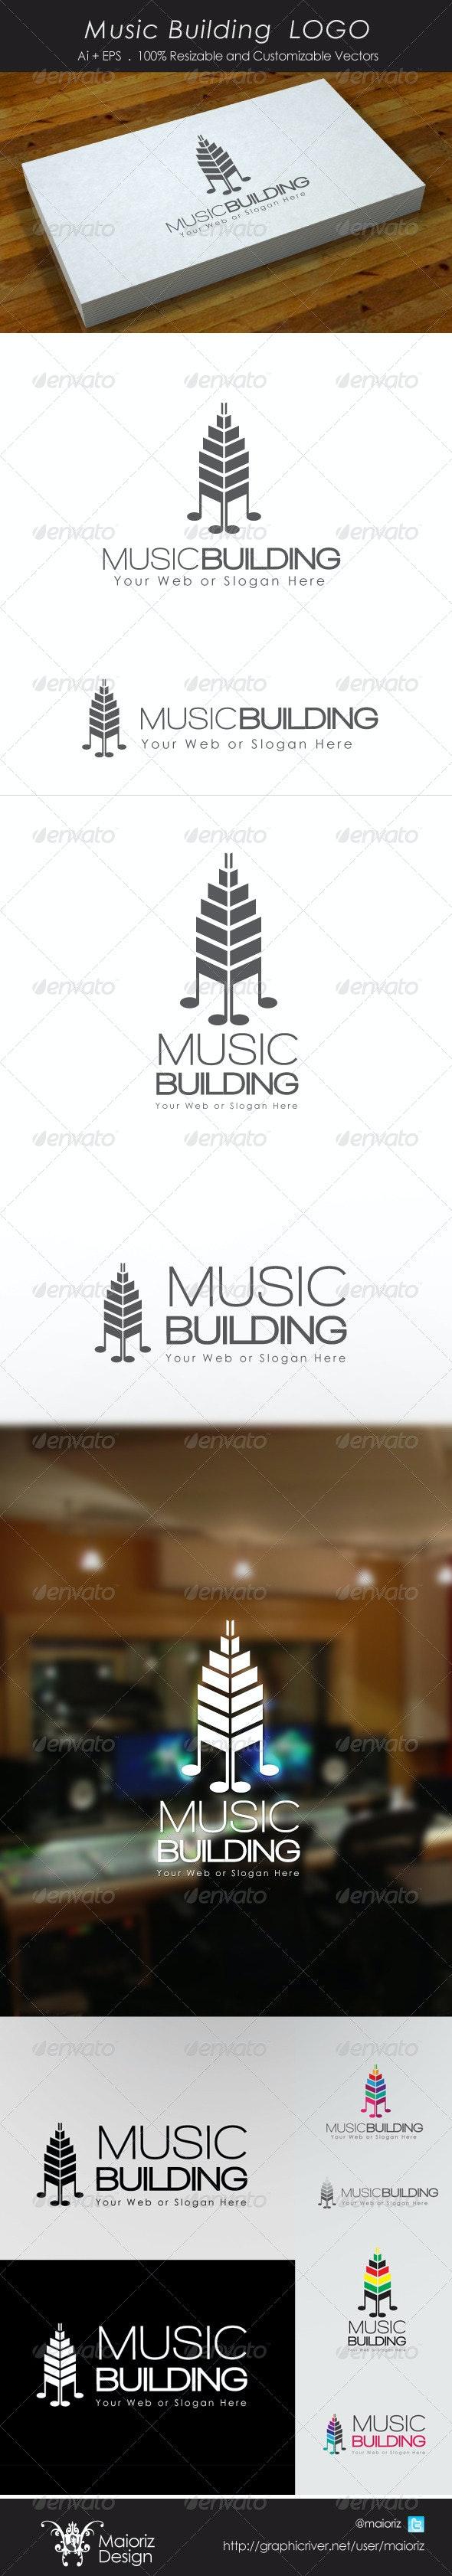 Music Building Logo - Buildings Logo Templates